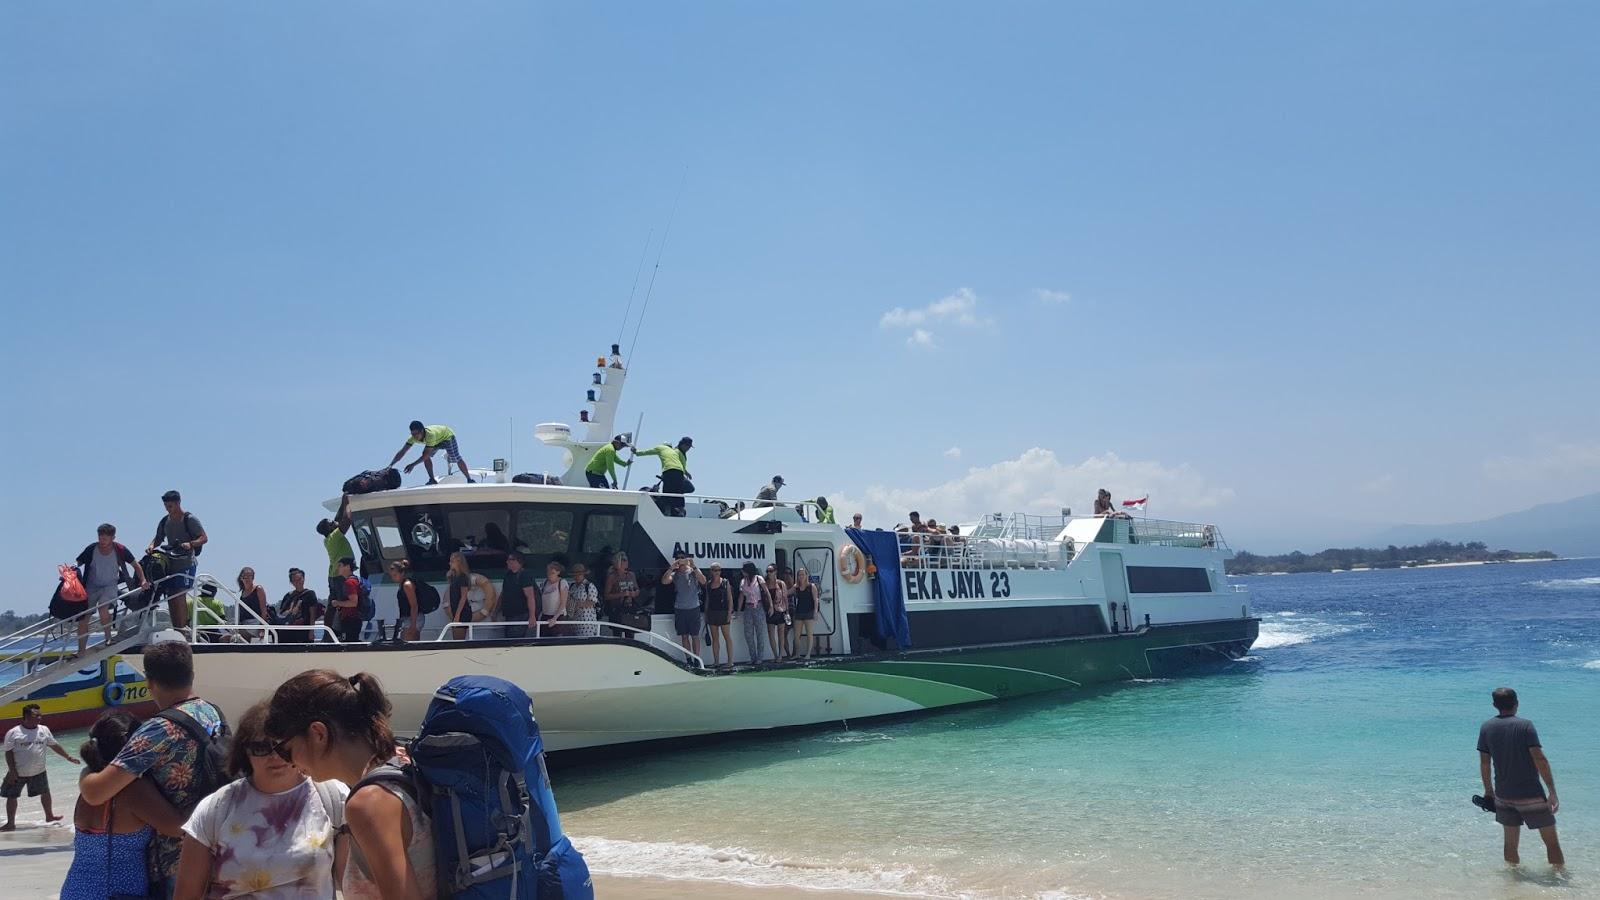 Ferry to Bali from Gili Trawangan